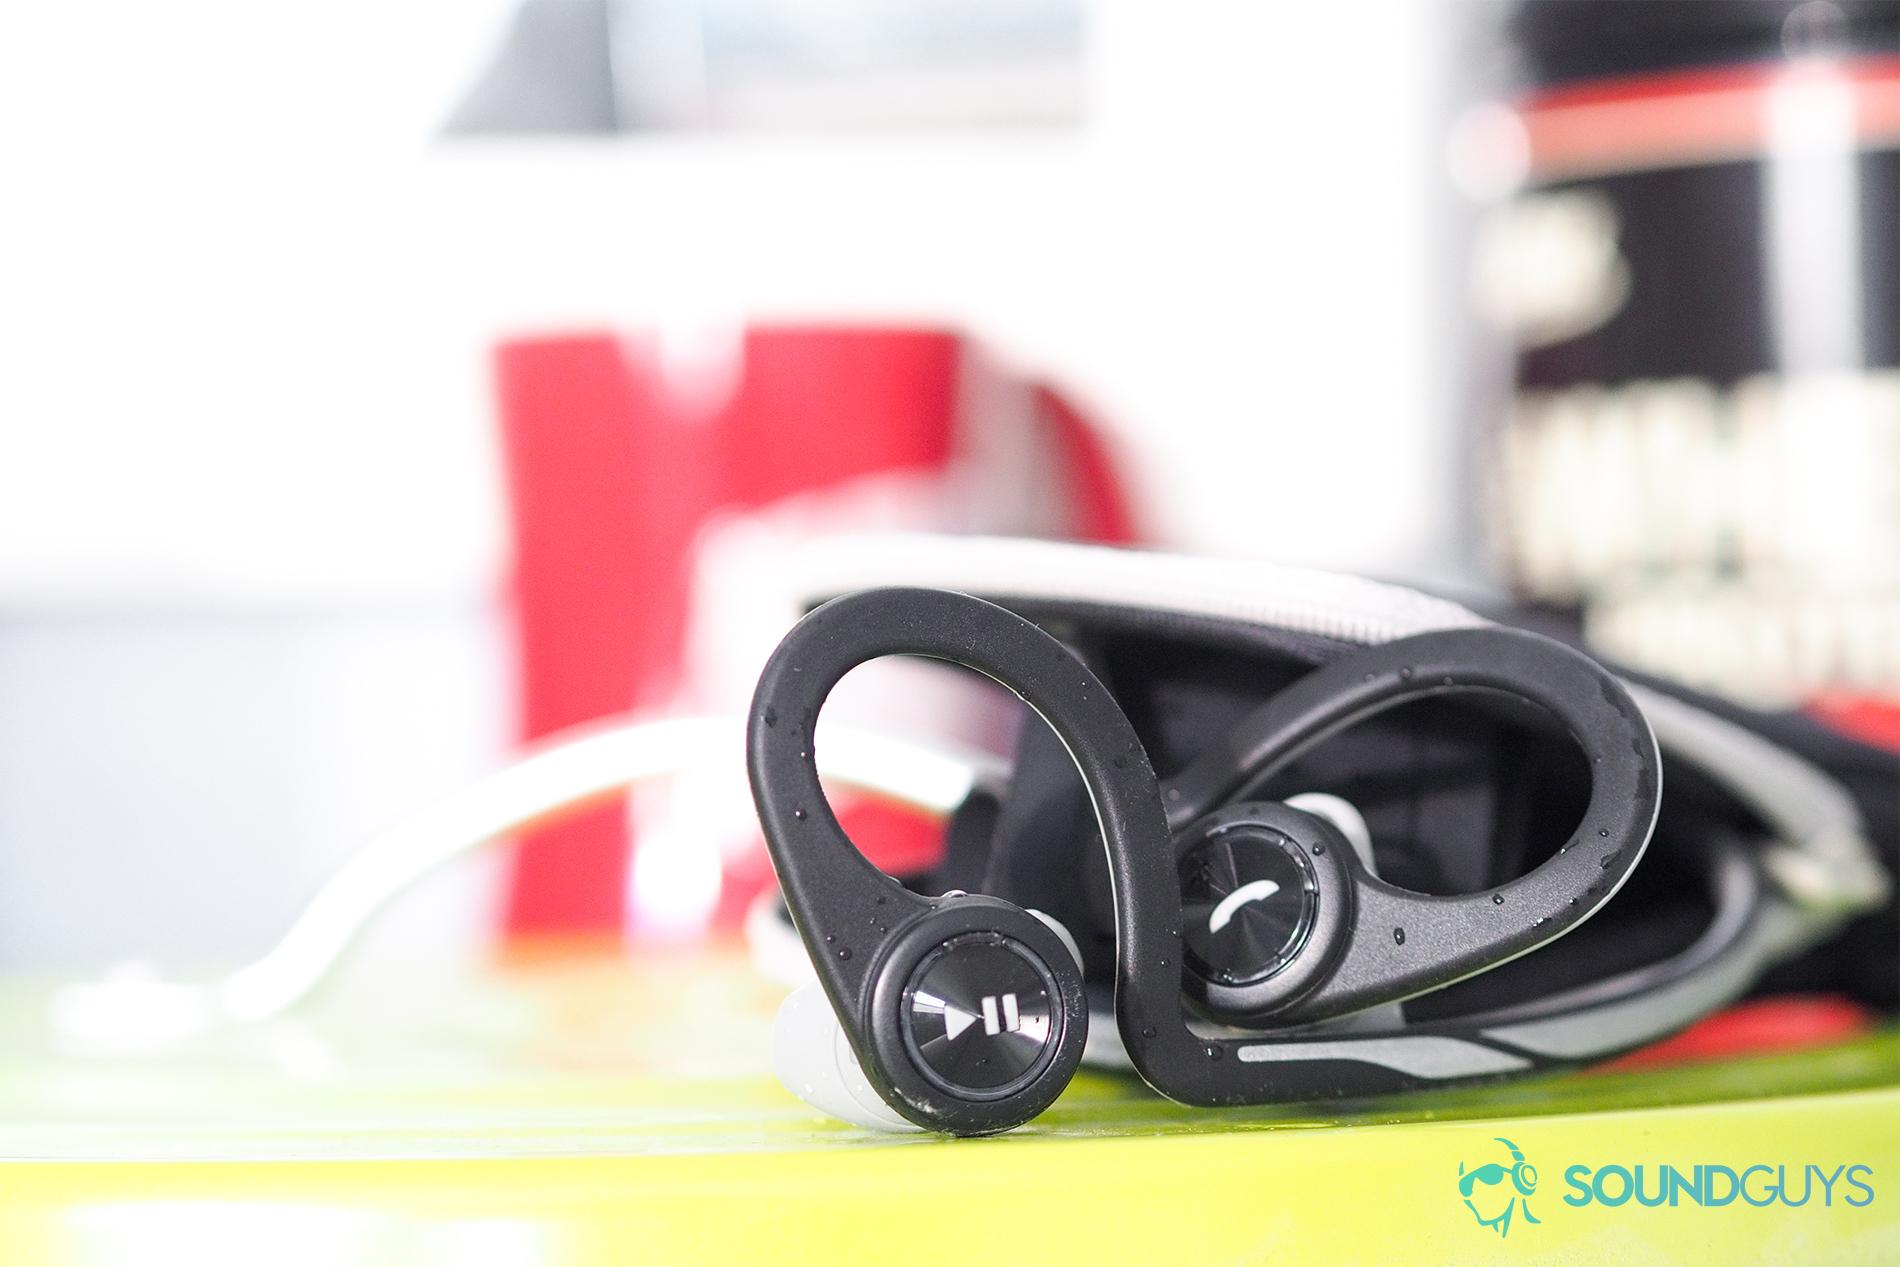 Wireless headphones bluetooth jawbone - wireless headphones not bluetooth